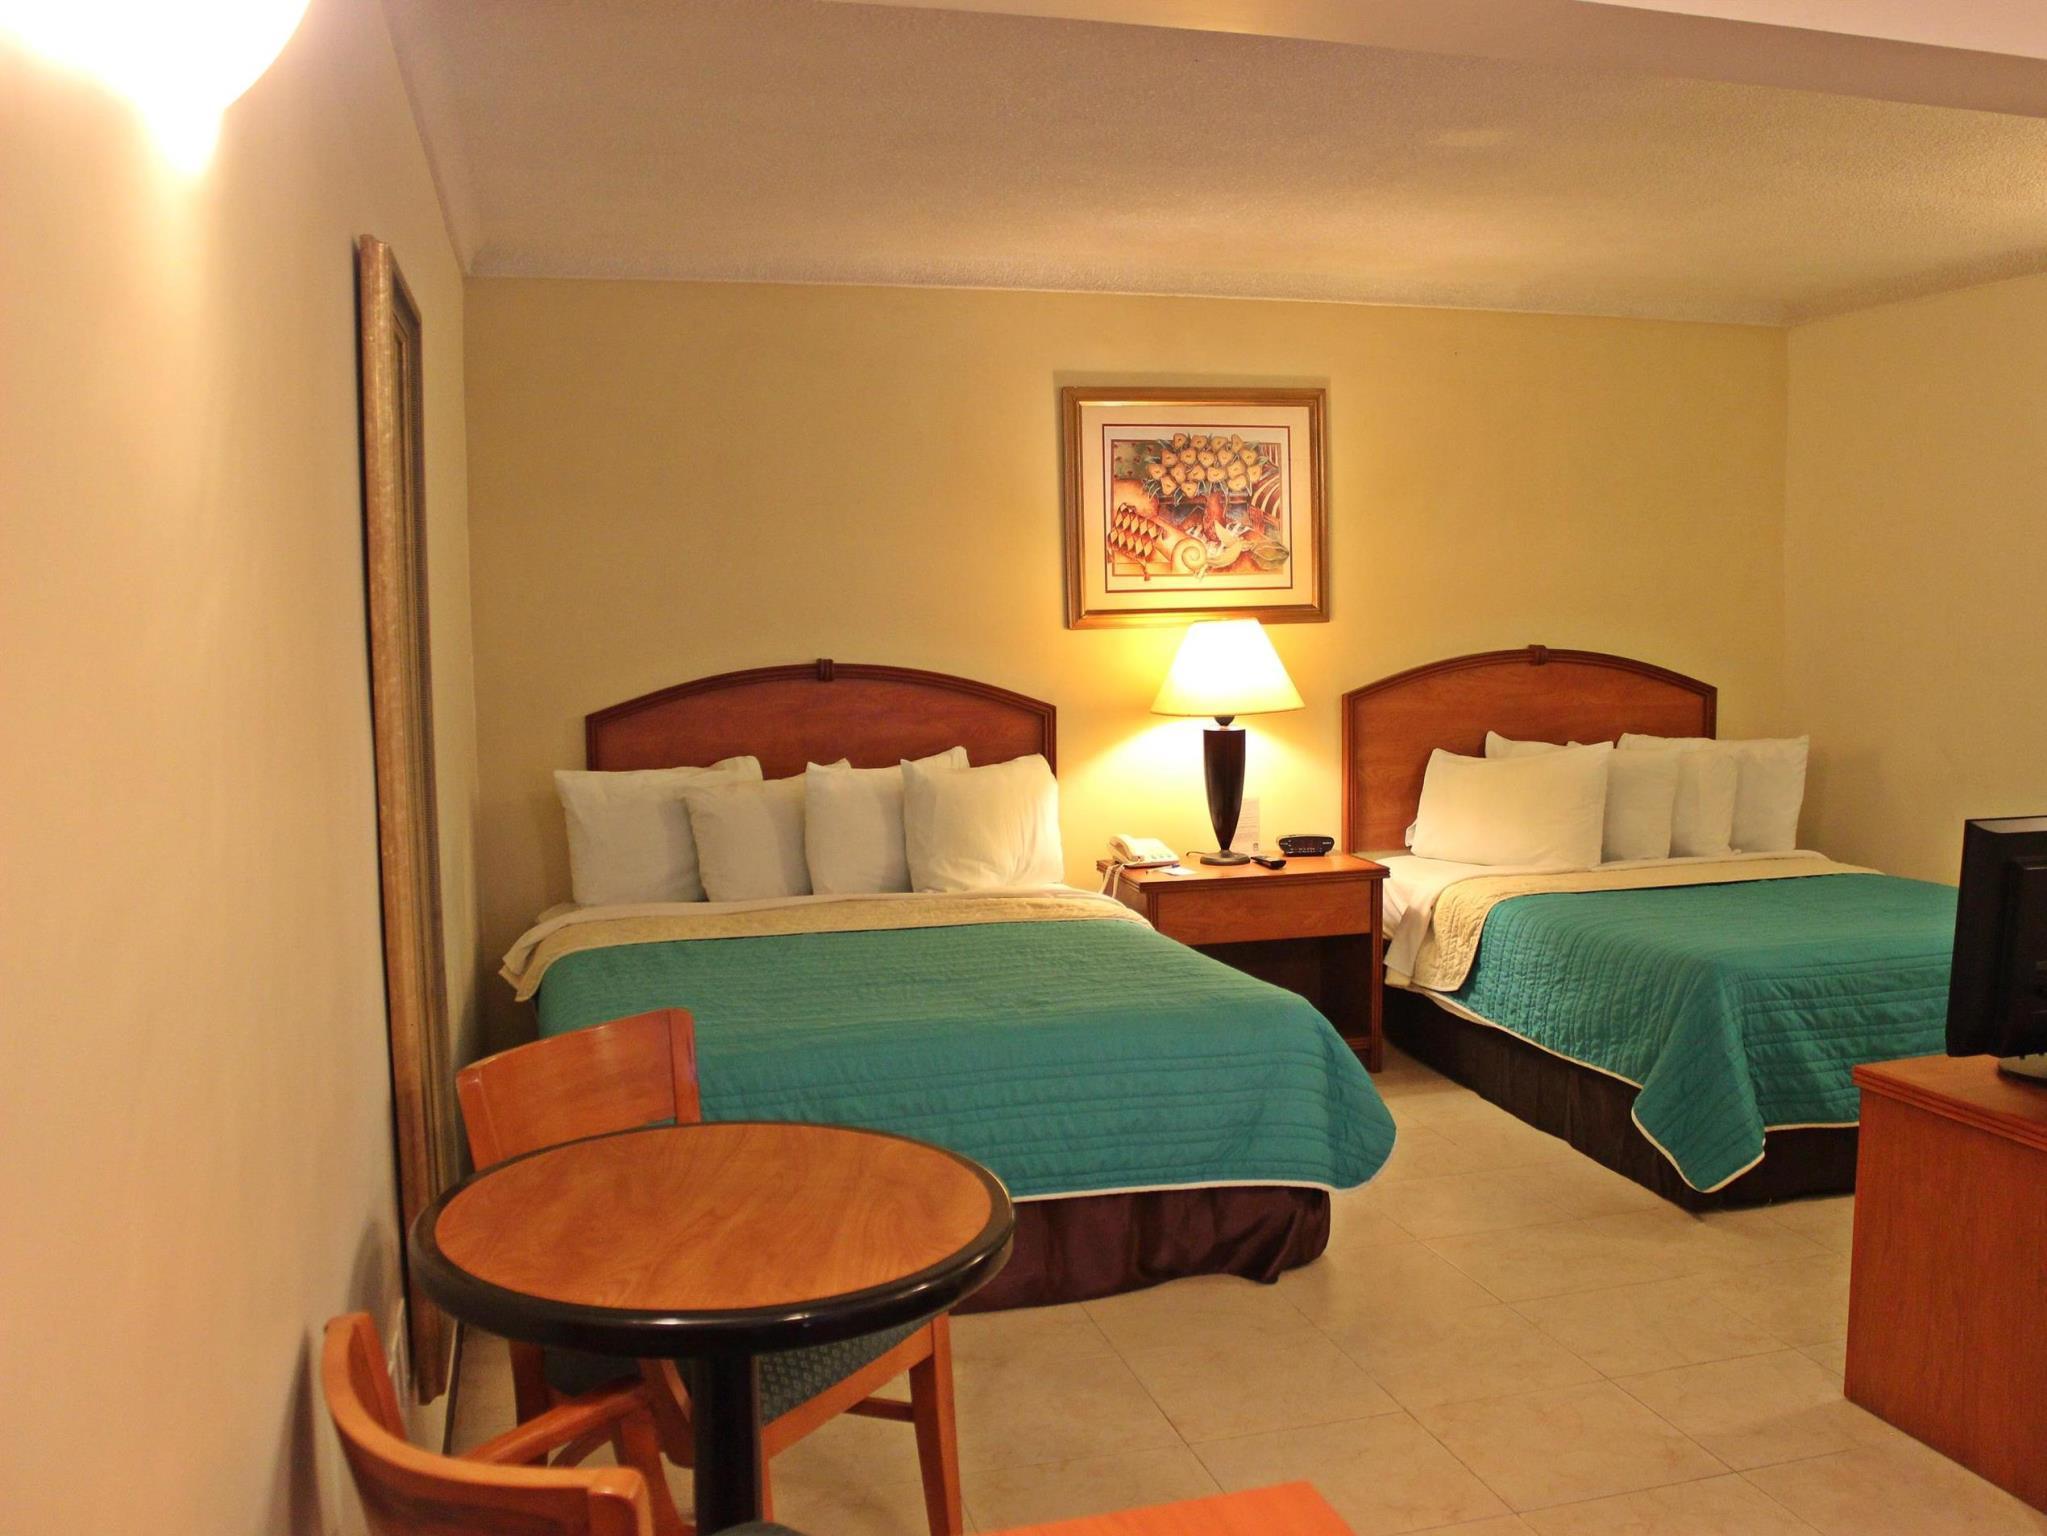 HAFERSONS INN HOTEL & SUITES